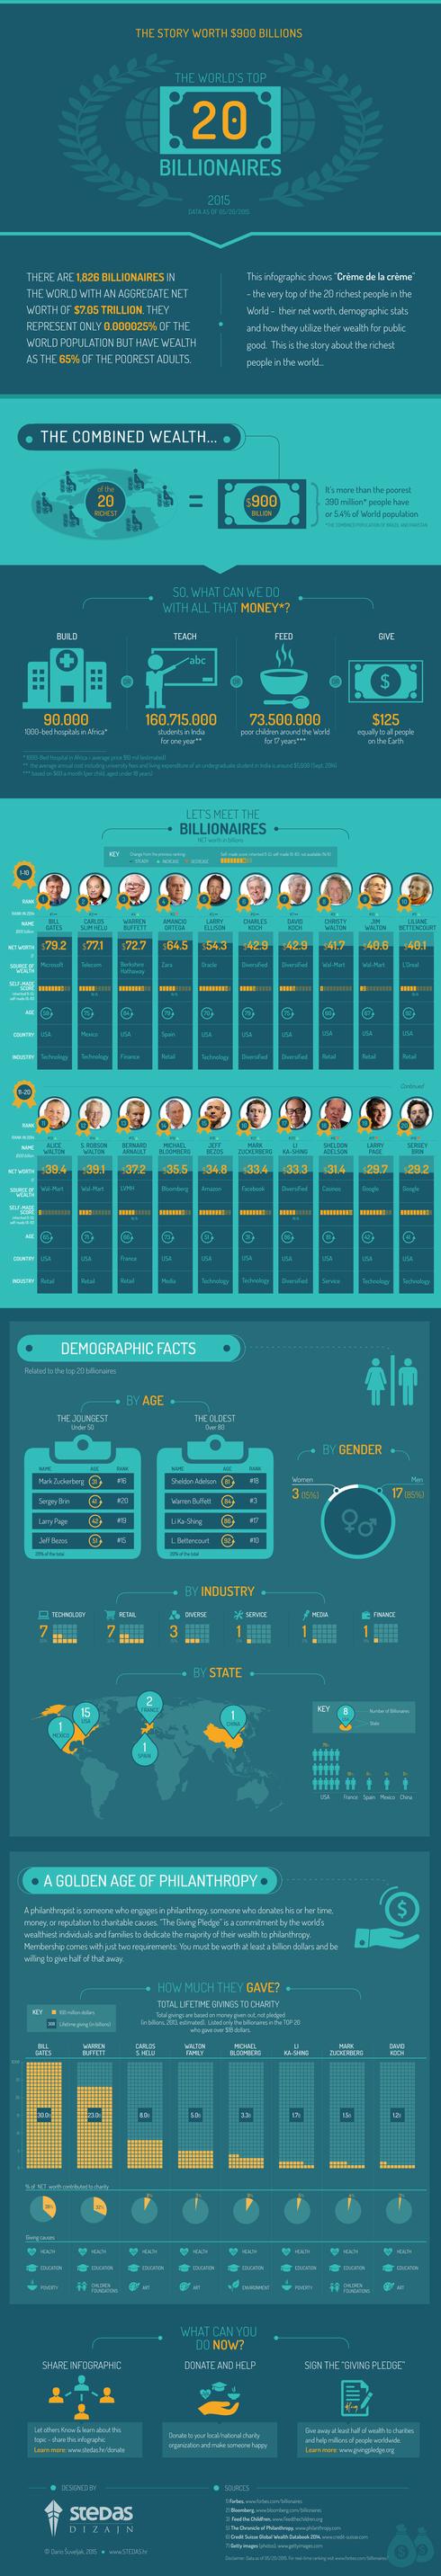 INFOGRAPHIC: The World's Top 20 Billionaires (2015) via Dario Suveljak